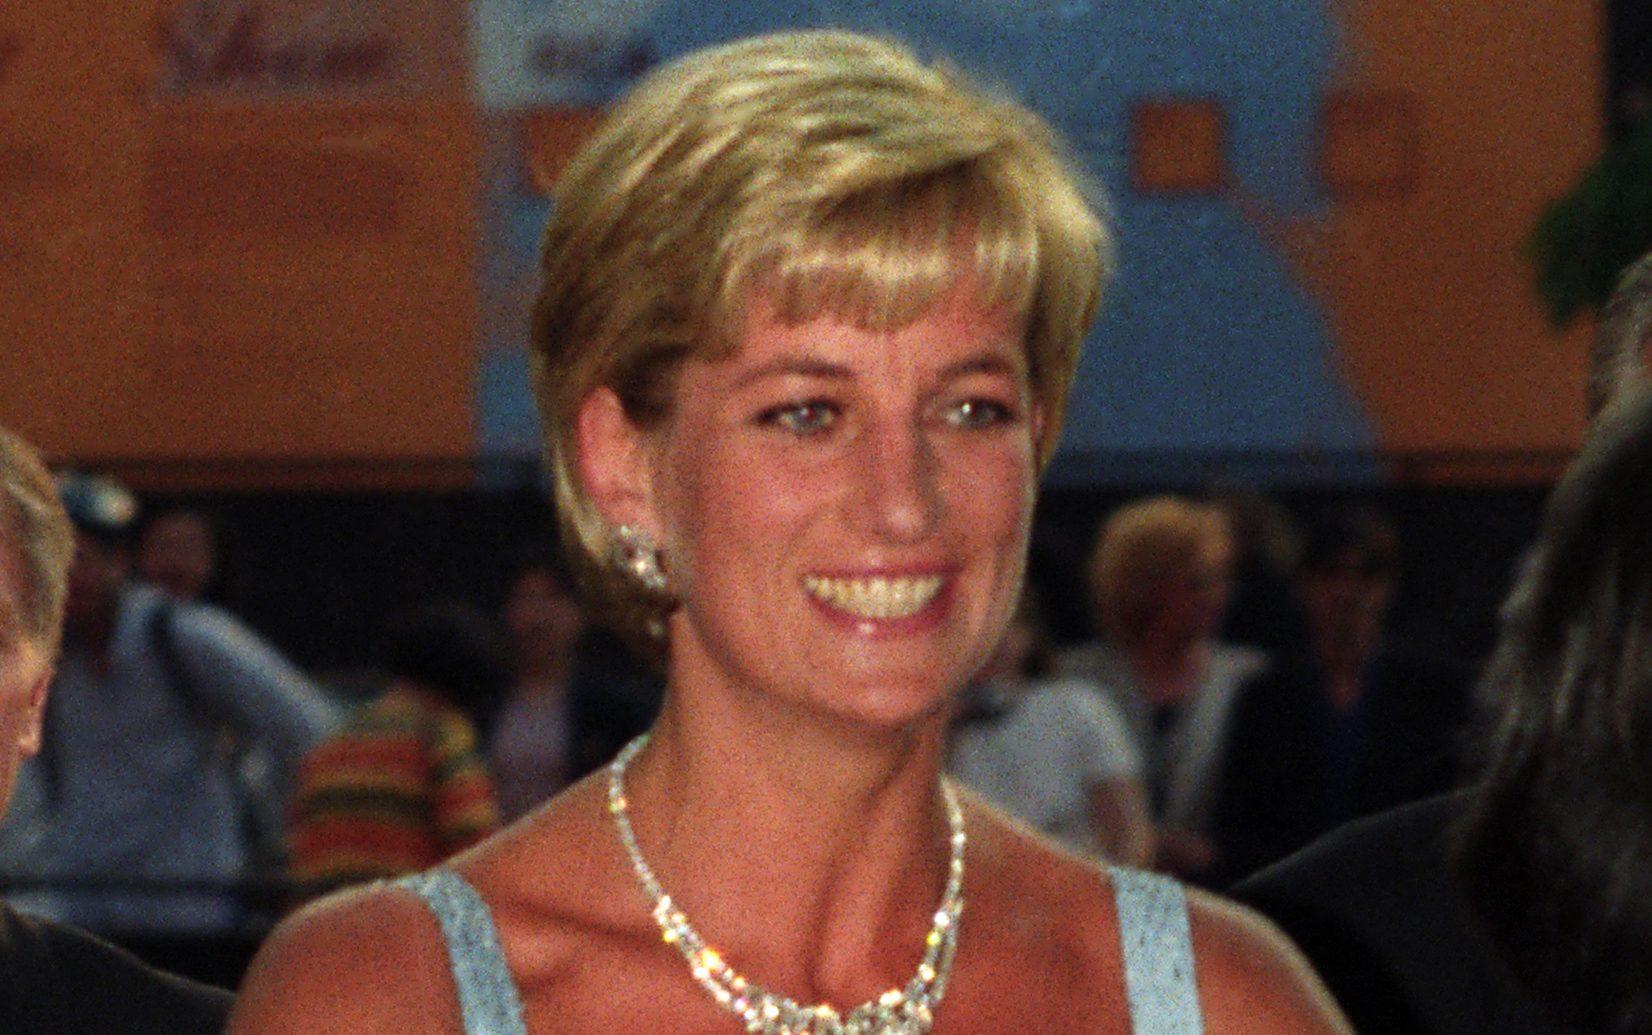 Princess Diana documentary set to claim she tried to kill herself four times